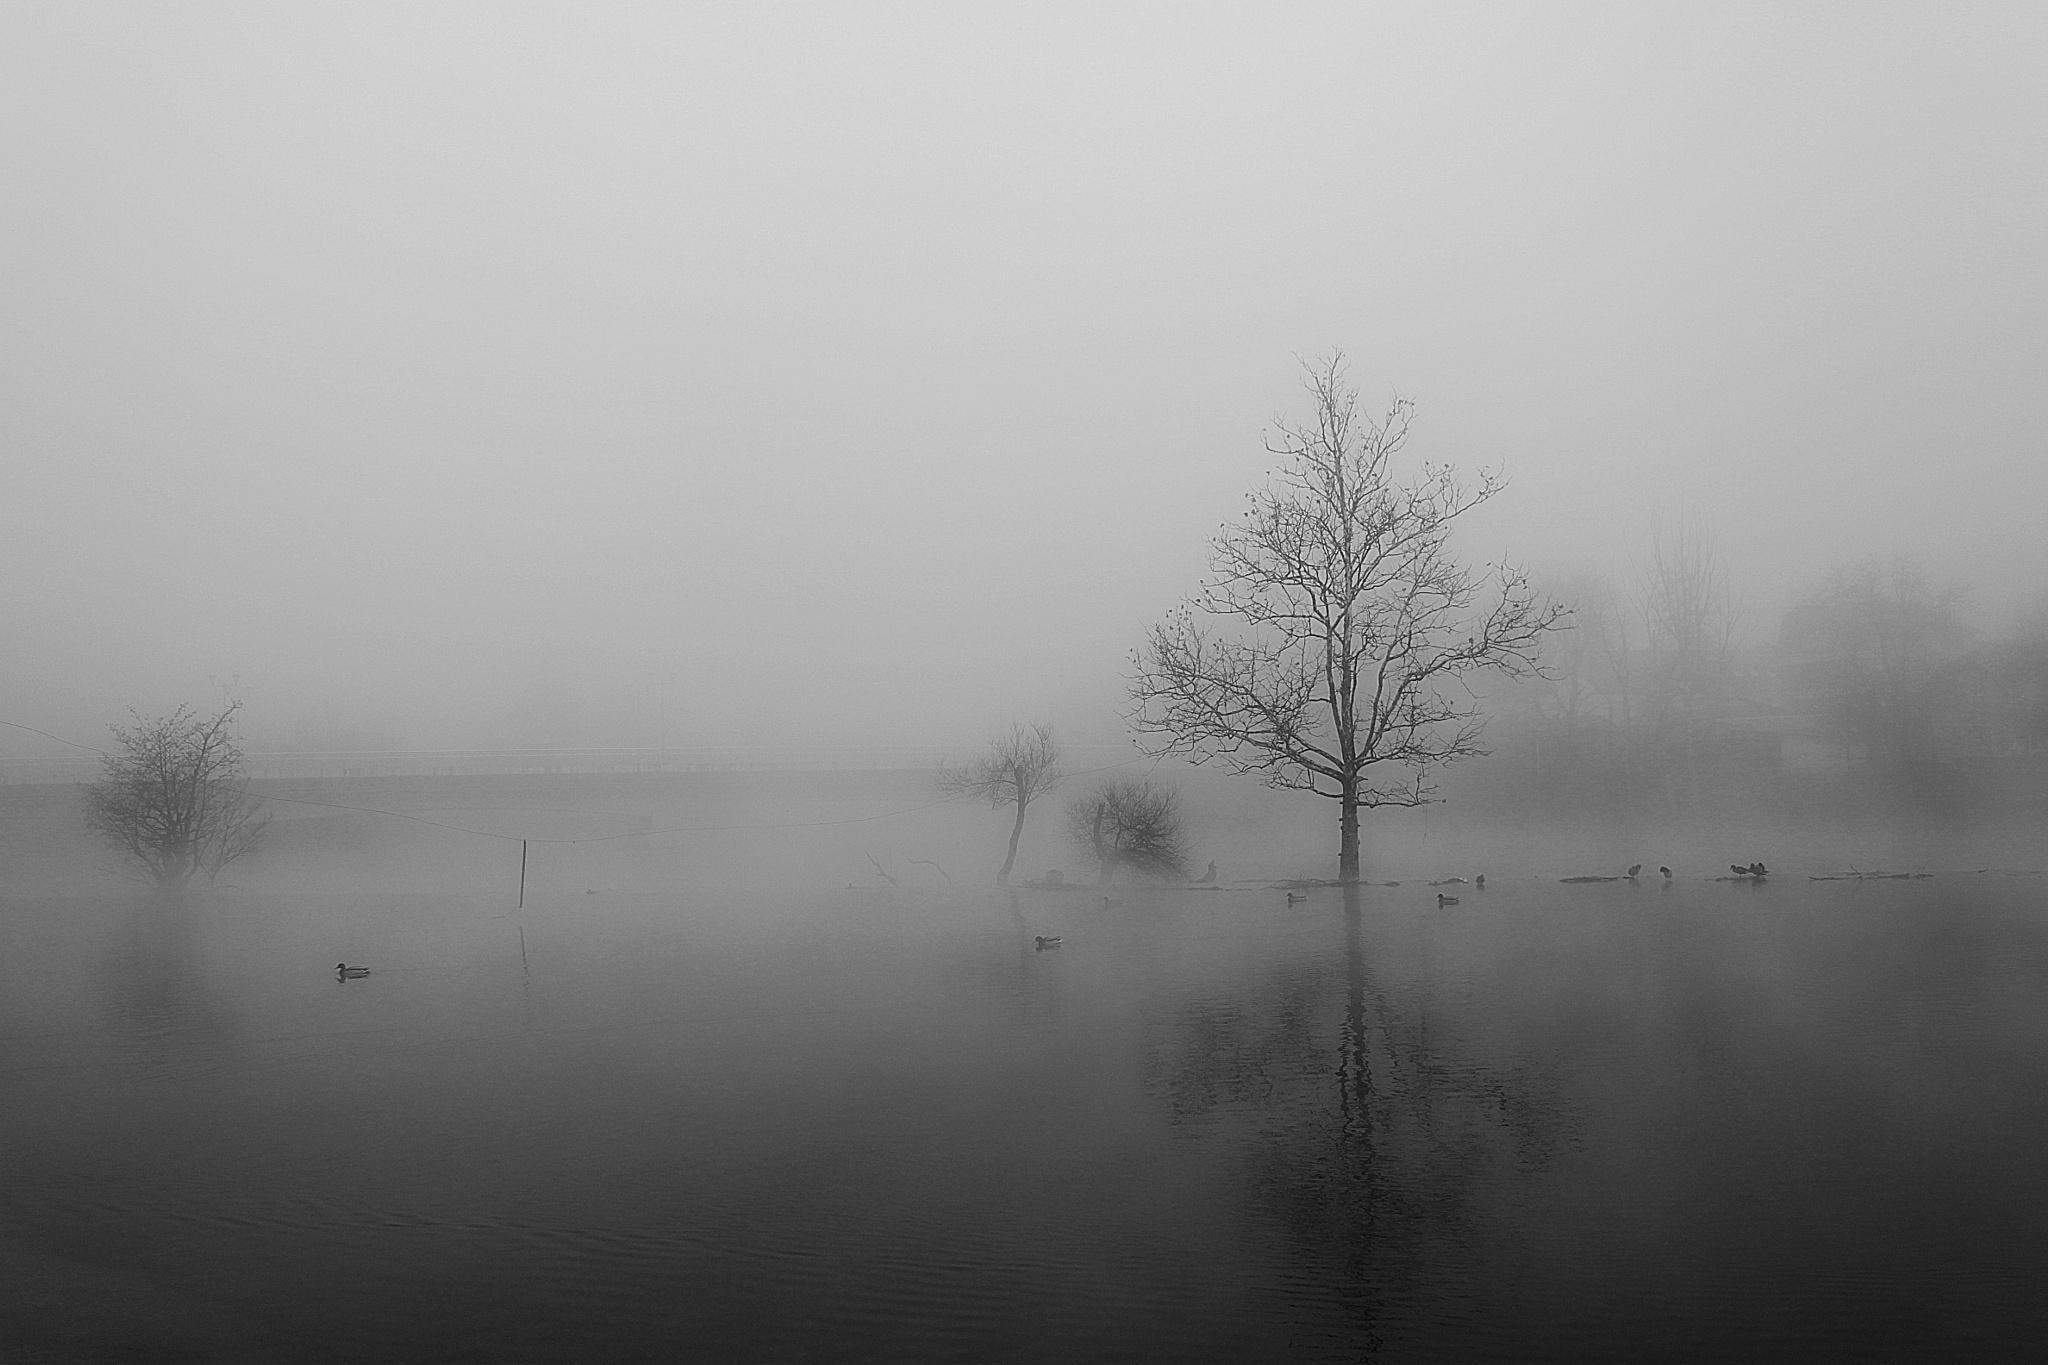 river blues by lenka samardzic